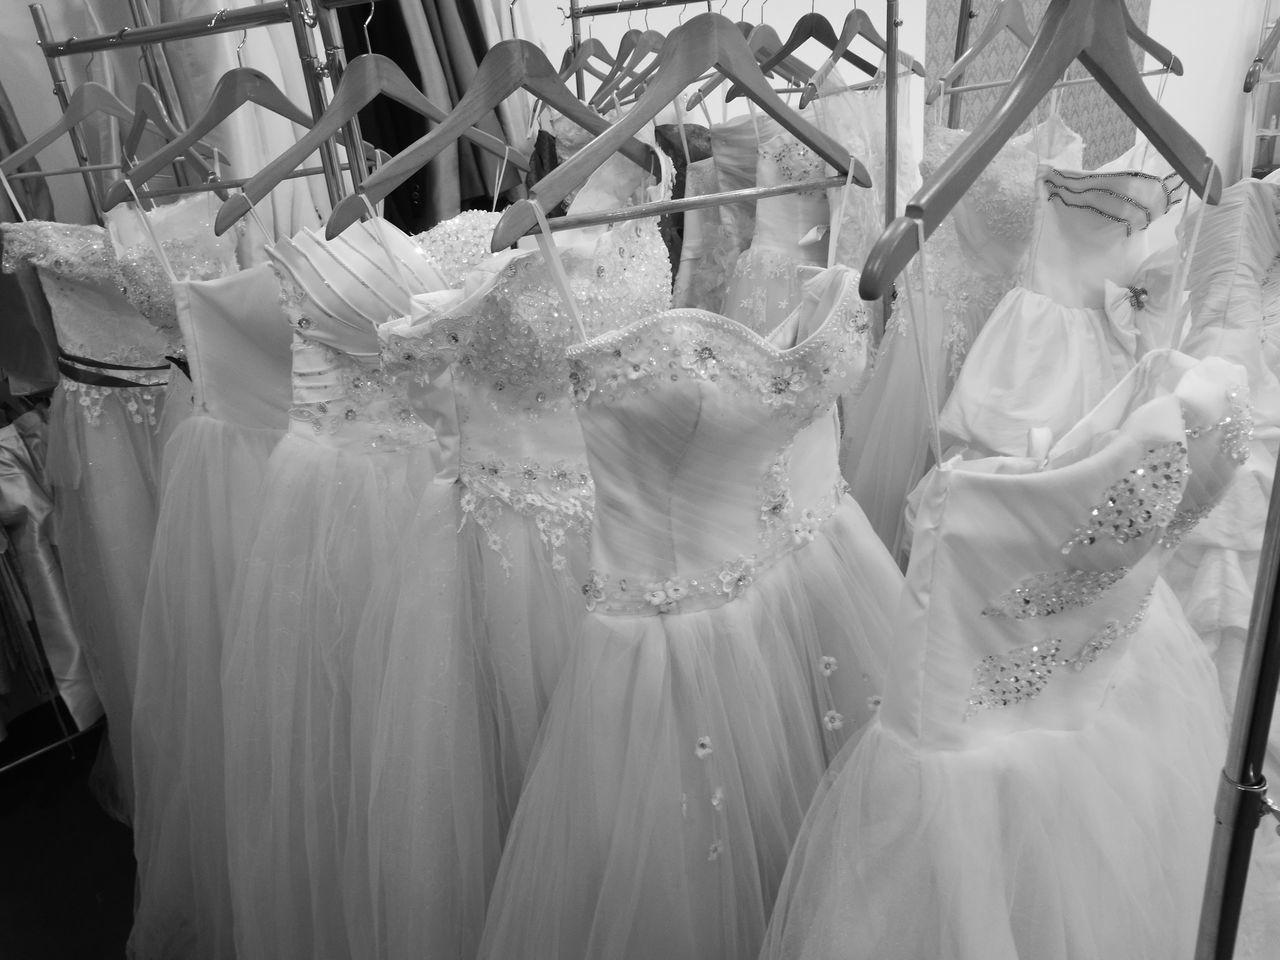 Wedding Dress Weddinginspiration Monochrome Blackandwhite